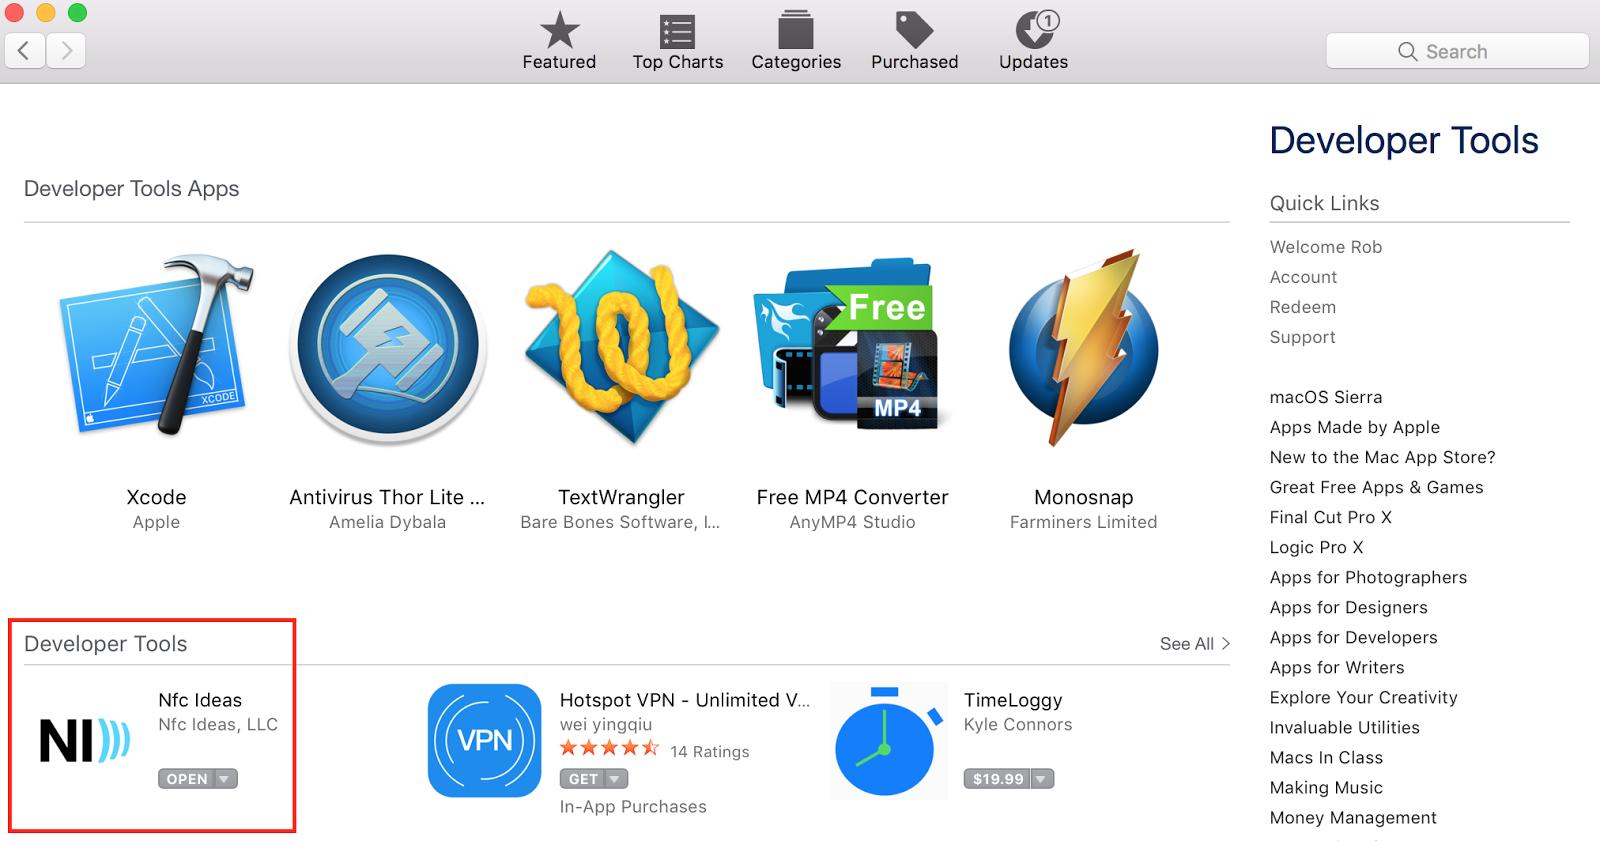 Nfc Ideas now on Mac App Store